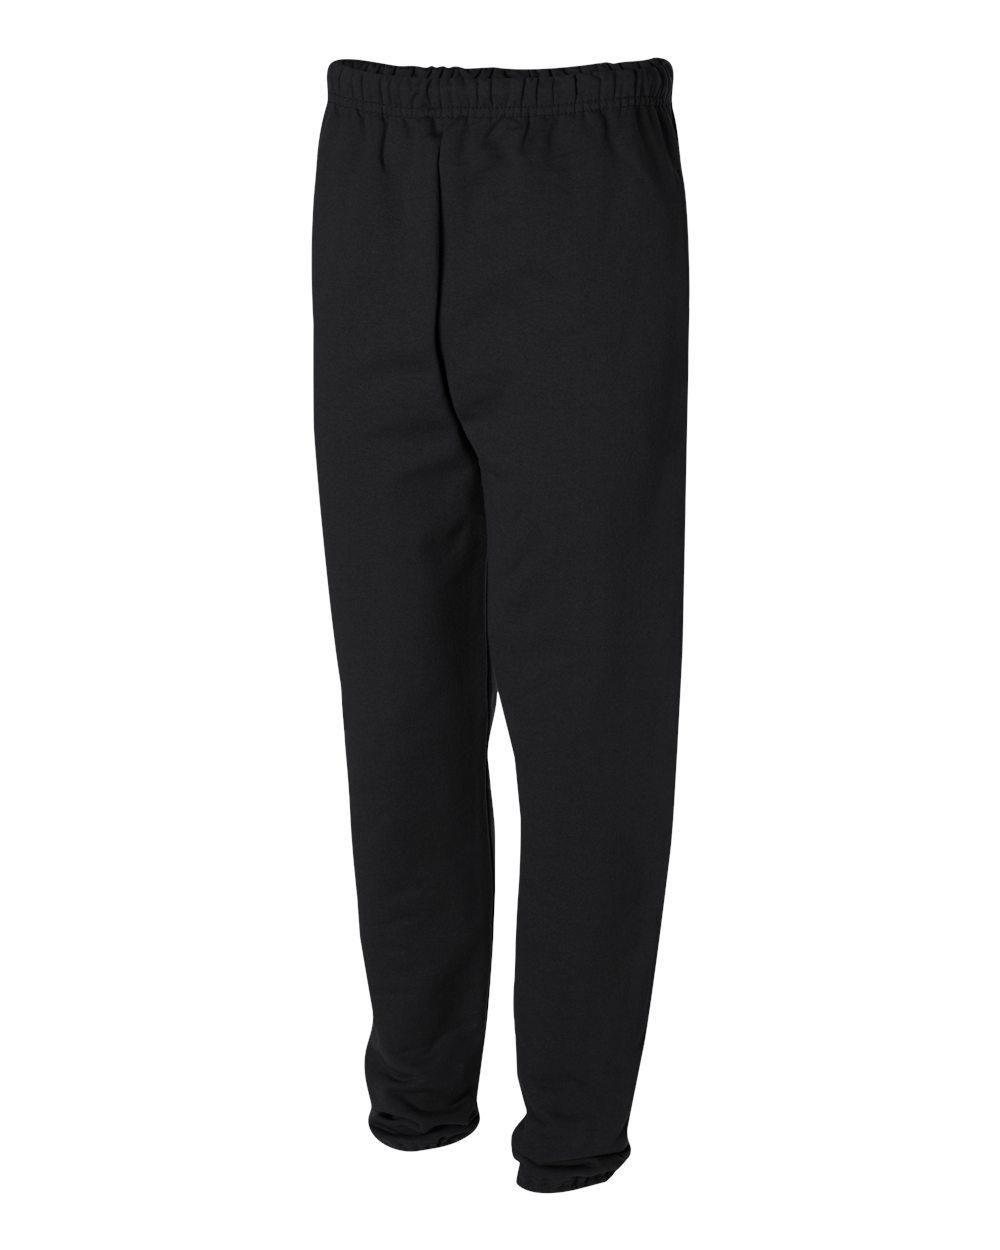 JERZEES 4850MR - NuBlend SUPER SWEATS Pocketed Sweatpants